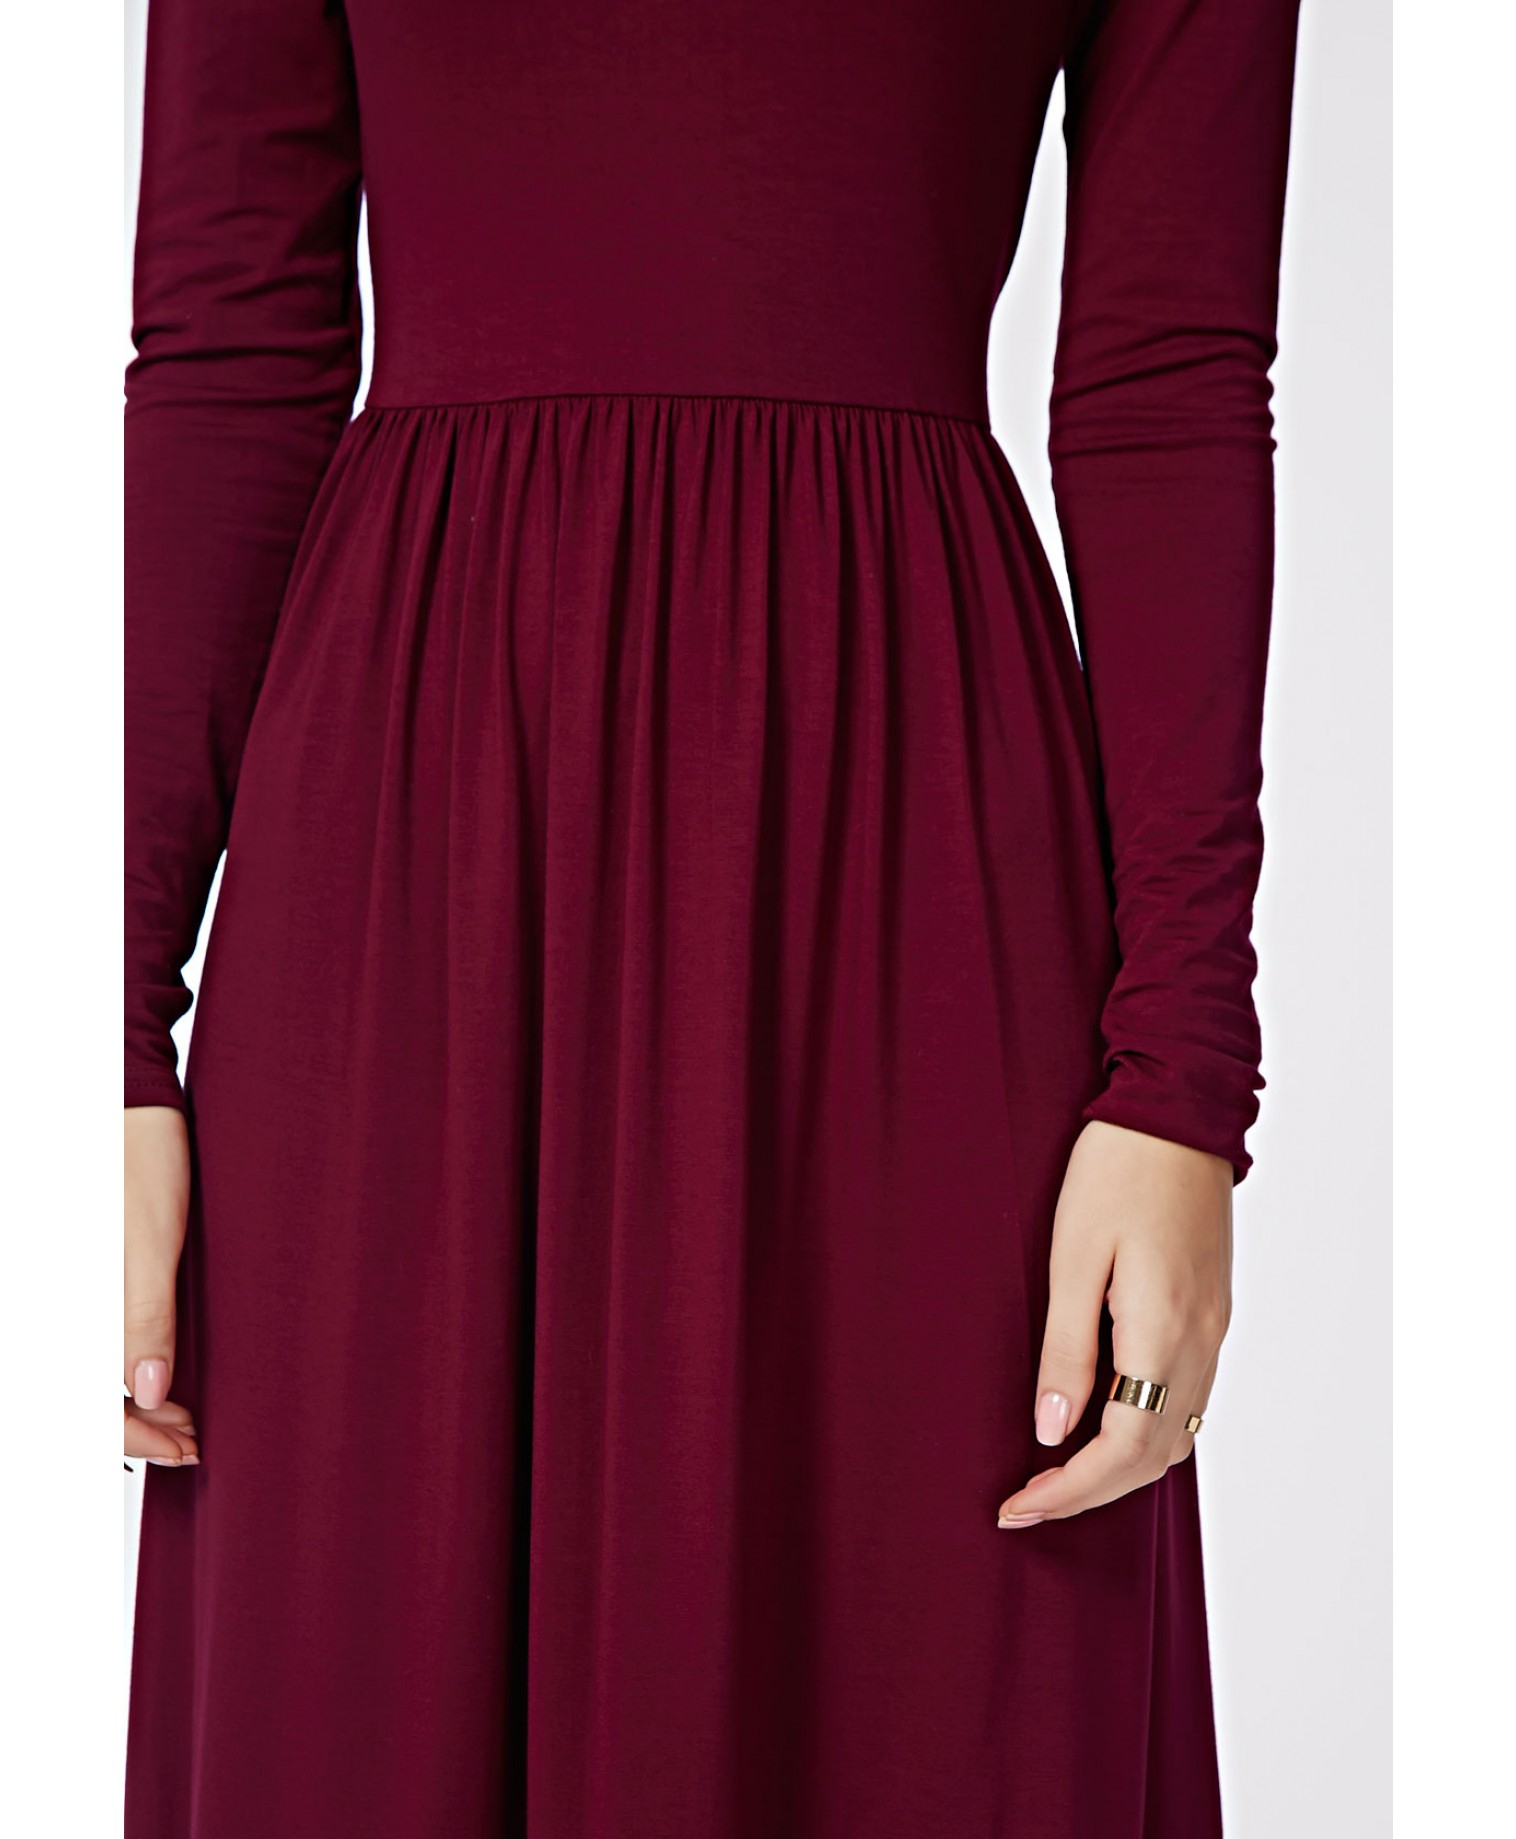 d843eb8c7a8 Missguided Tilda Long Sleeve Jersey Midi Dress Oxblood in Purple - Lyst